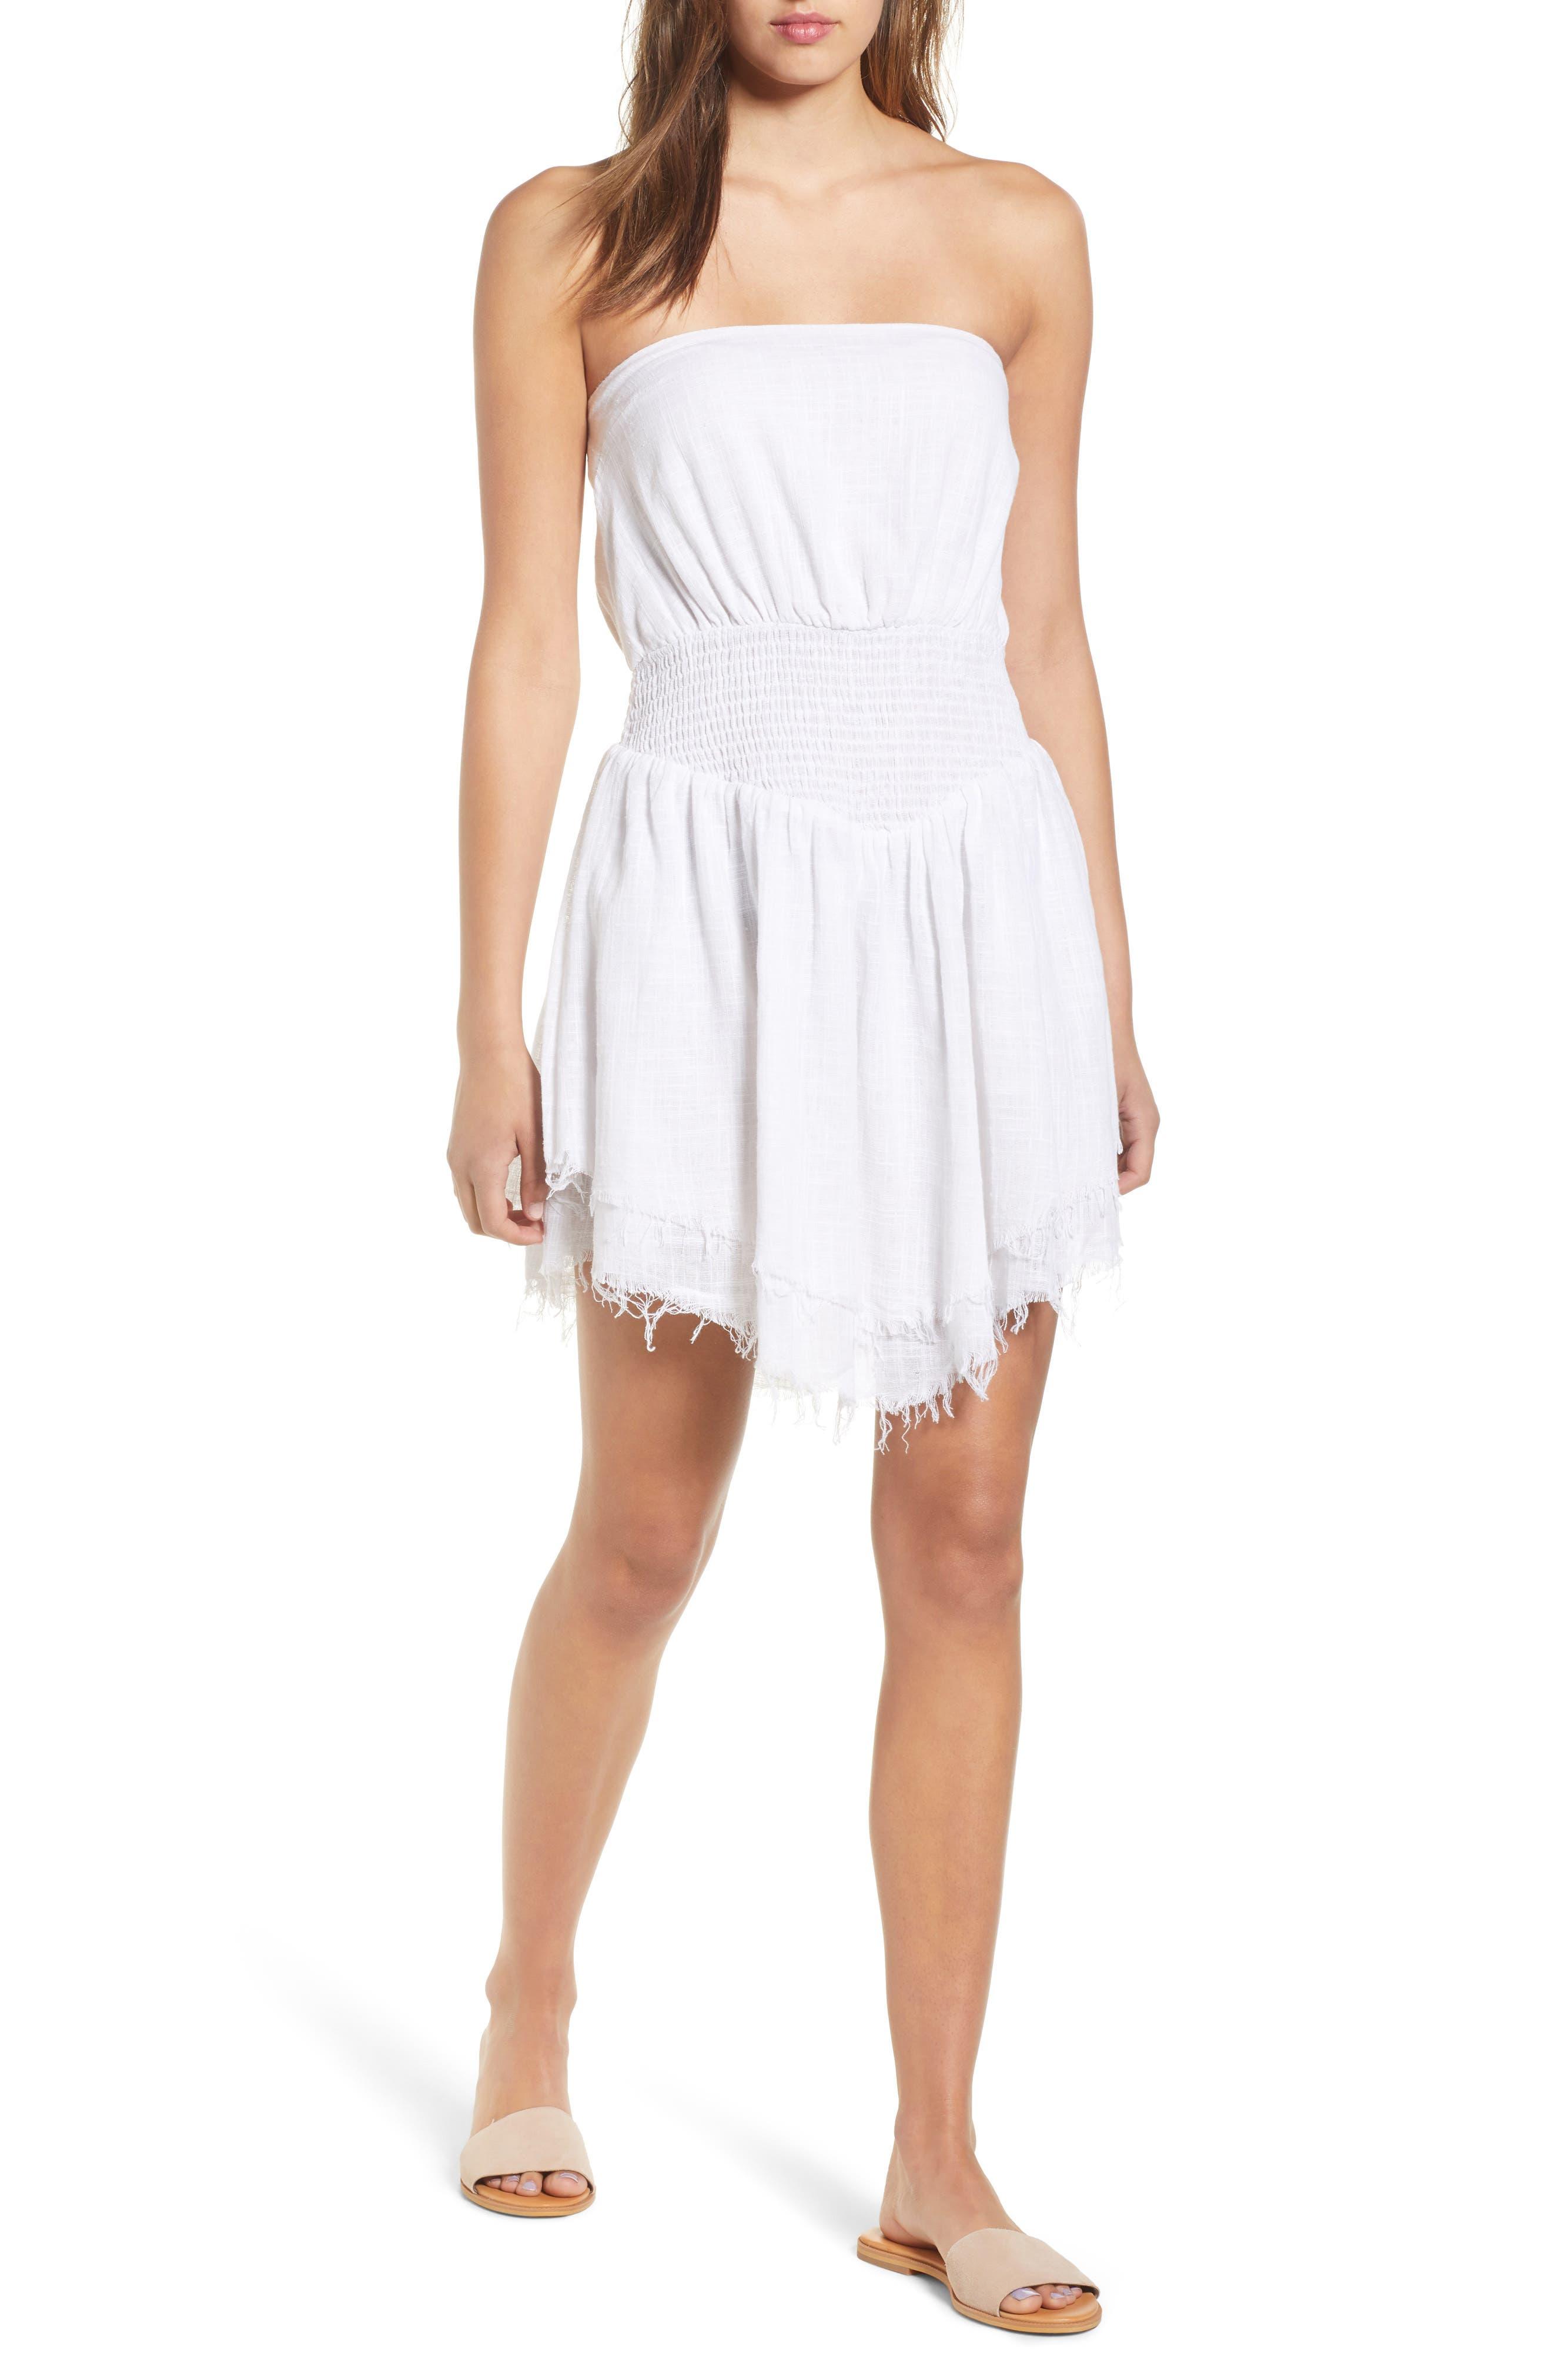 Lucid Dreaming Strapless Minidress,                         Main,                         color,